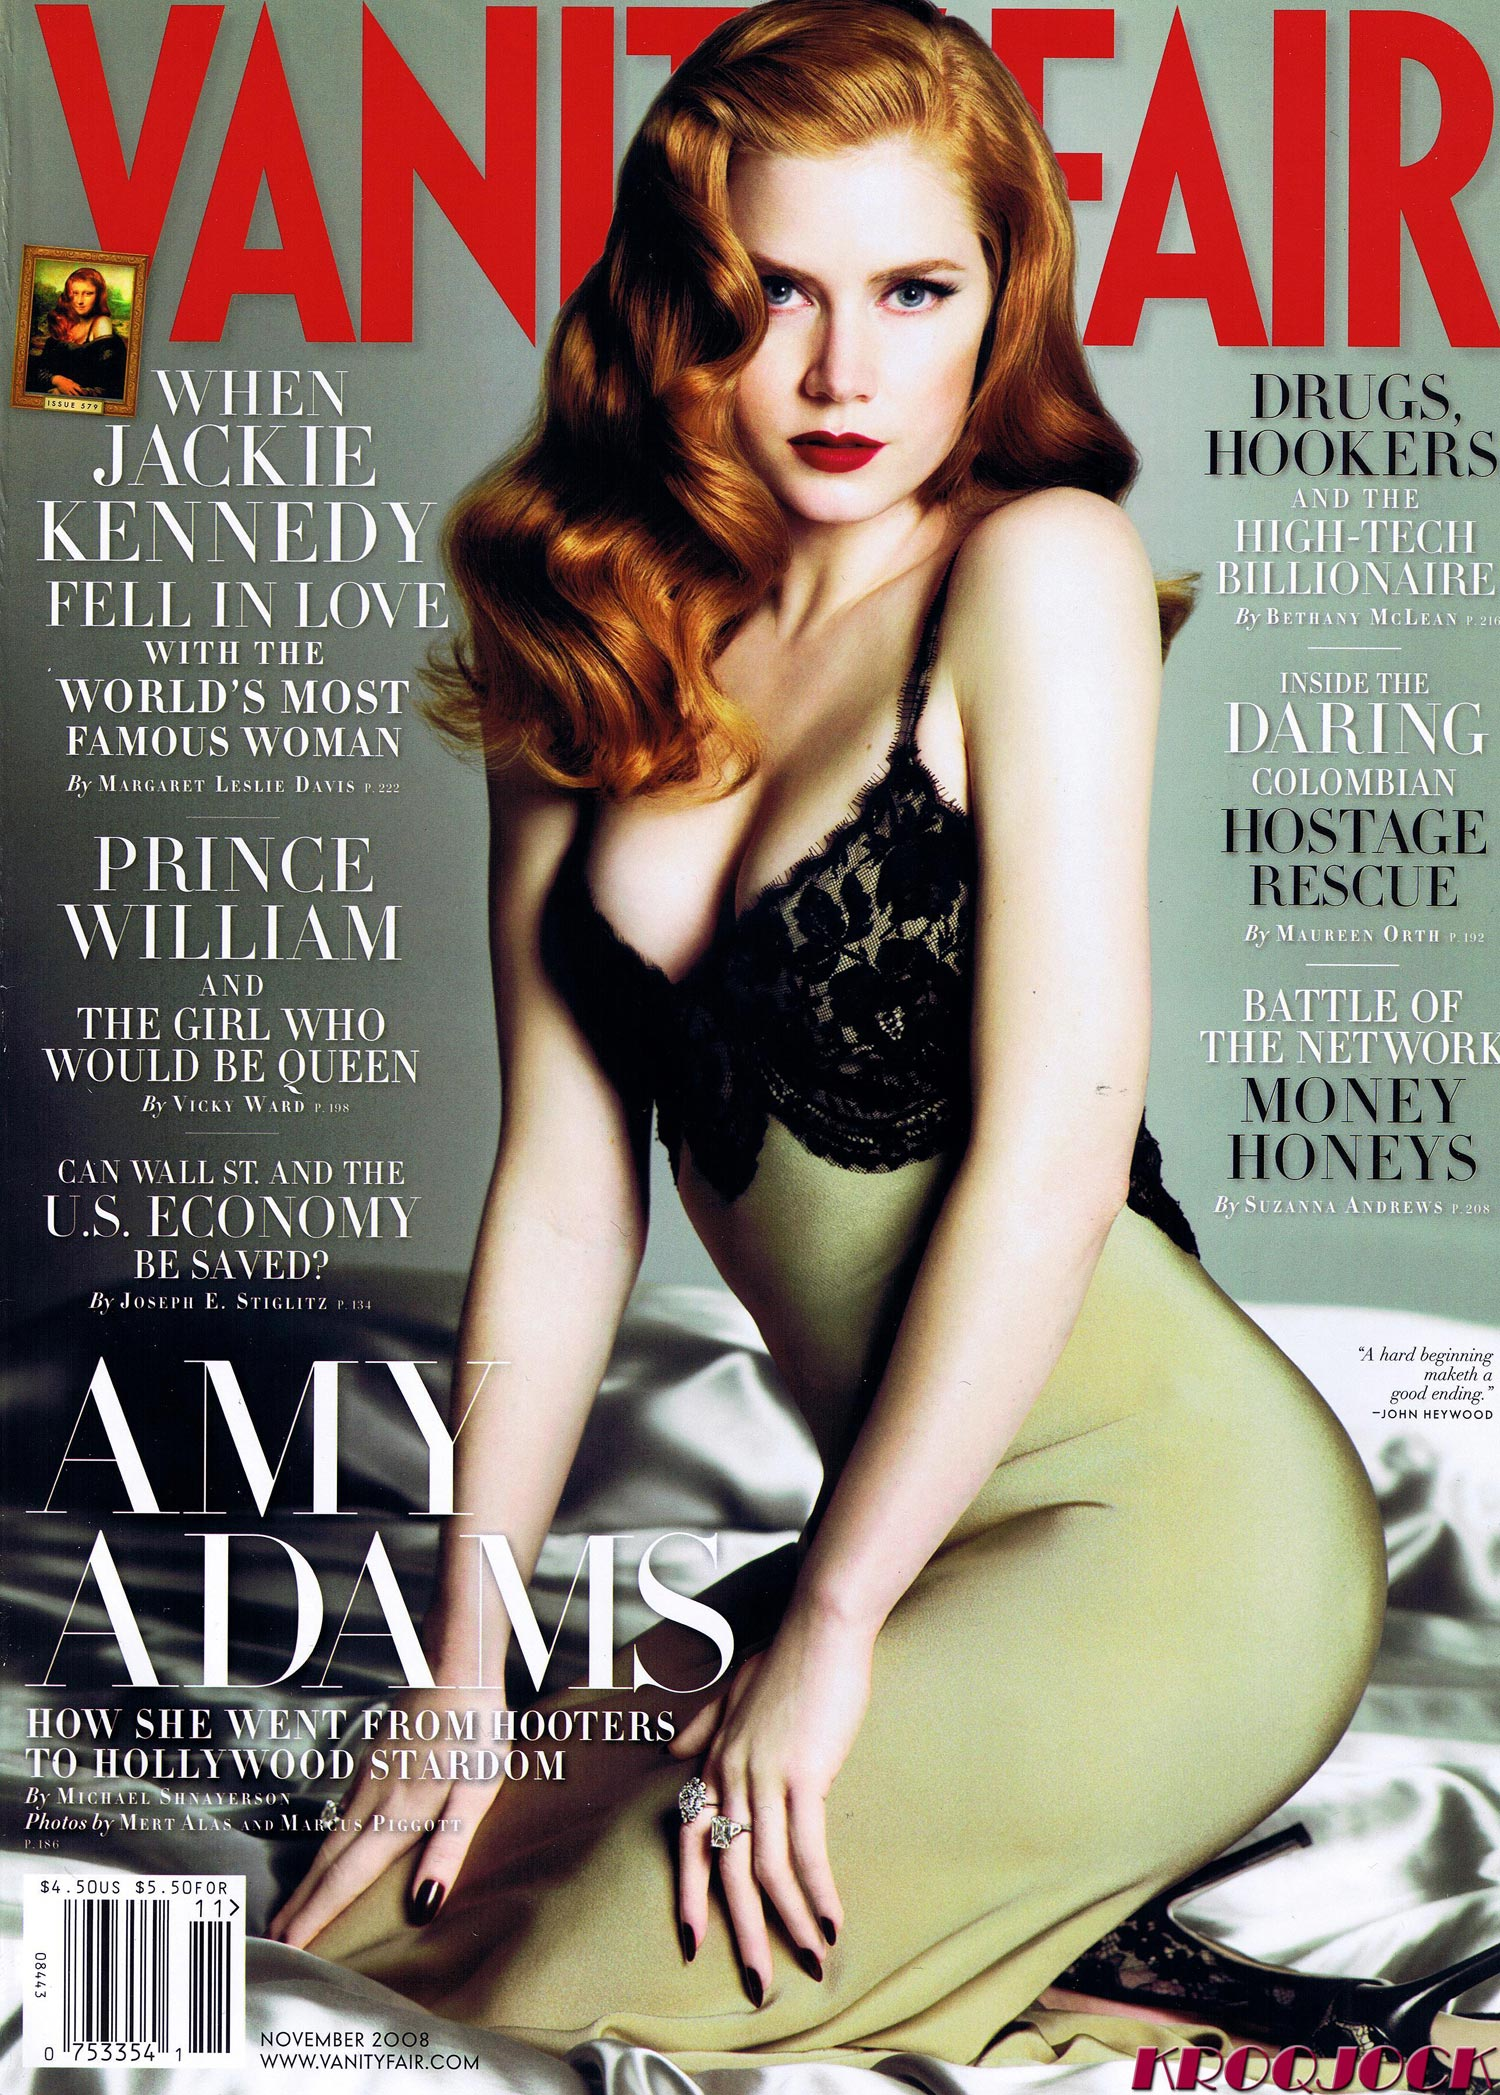 Delightful Amy Adams   Vanity Fair Magazine November 2008   High Quality Scans    Gallery